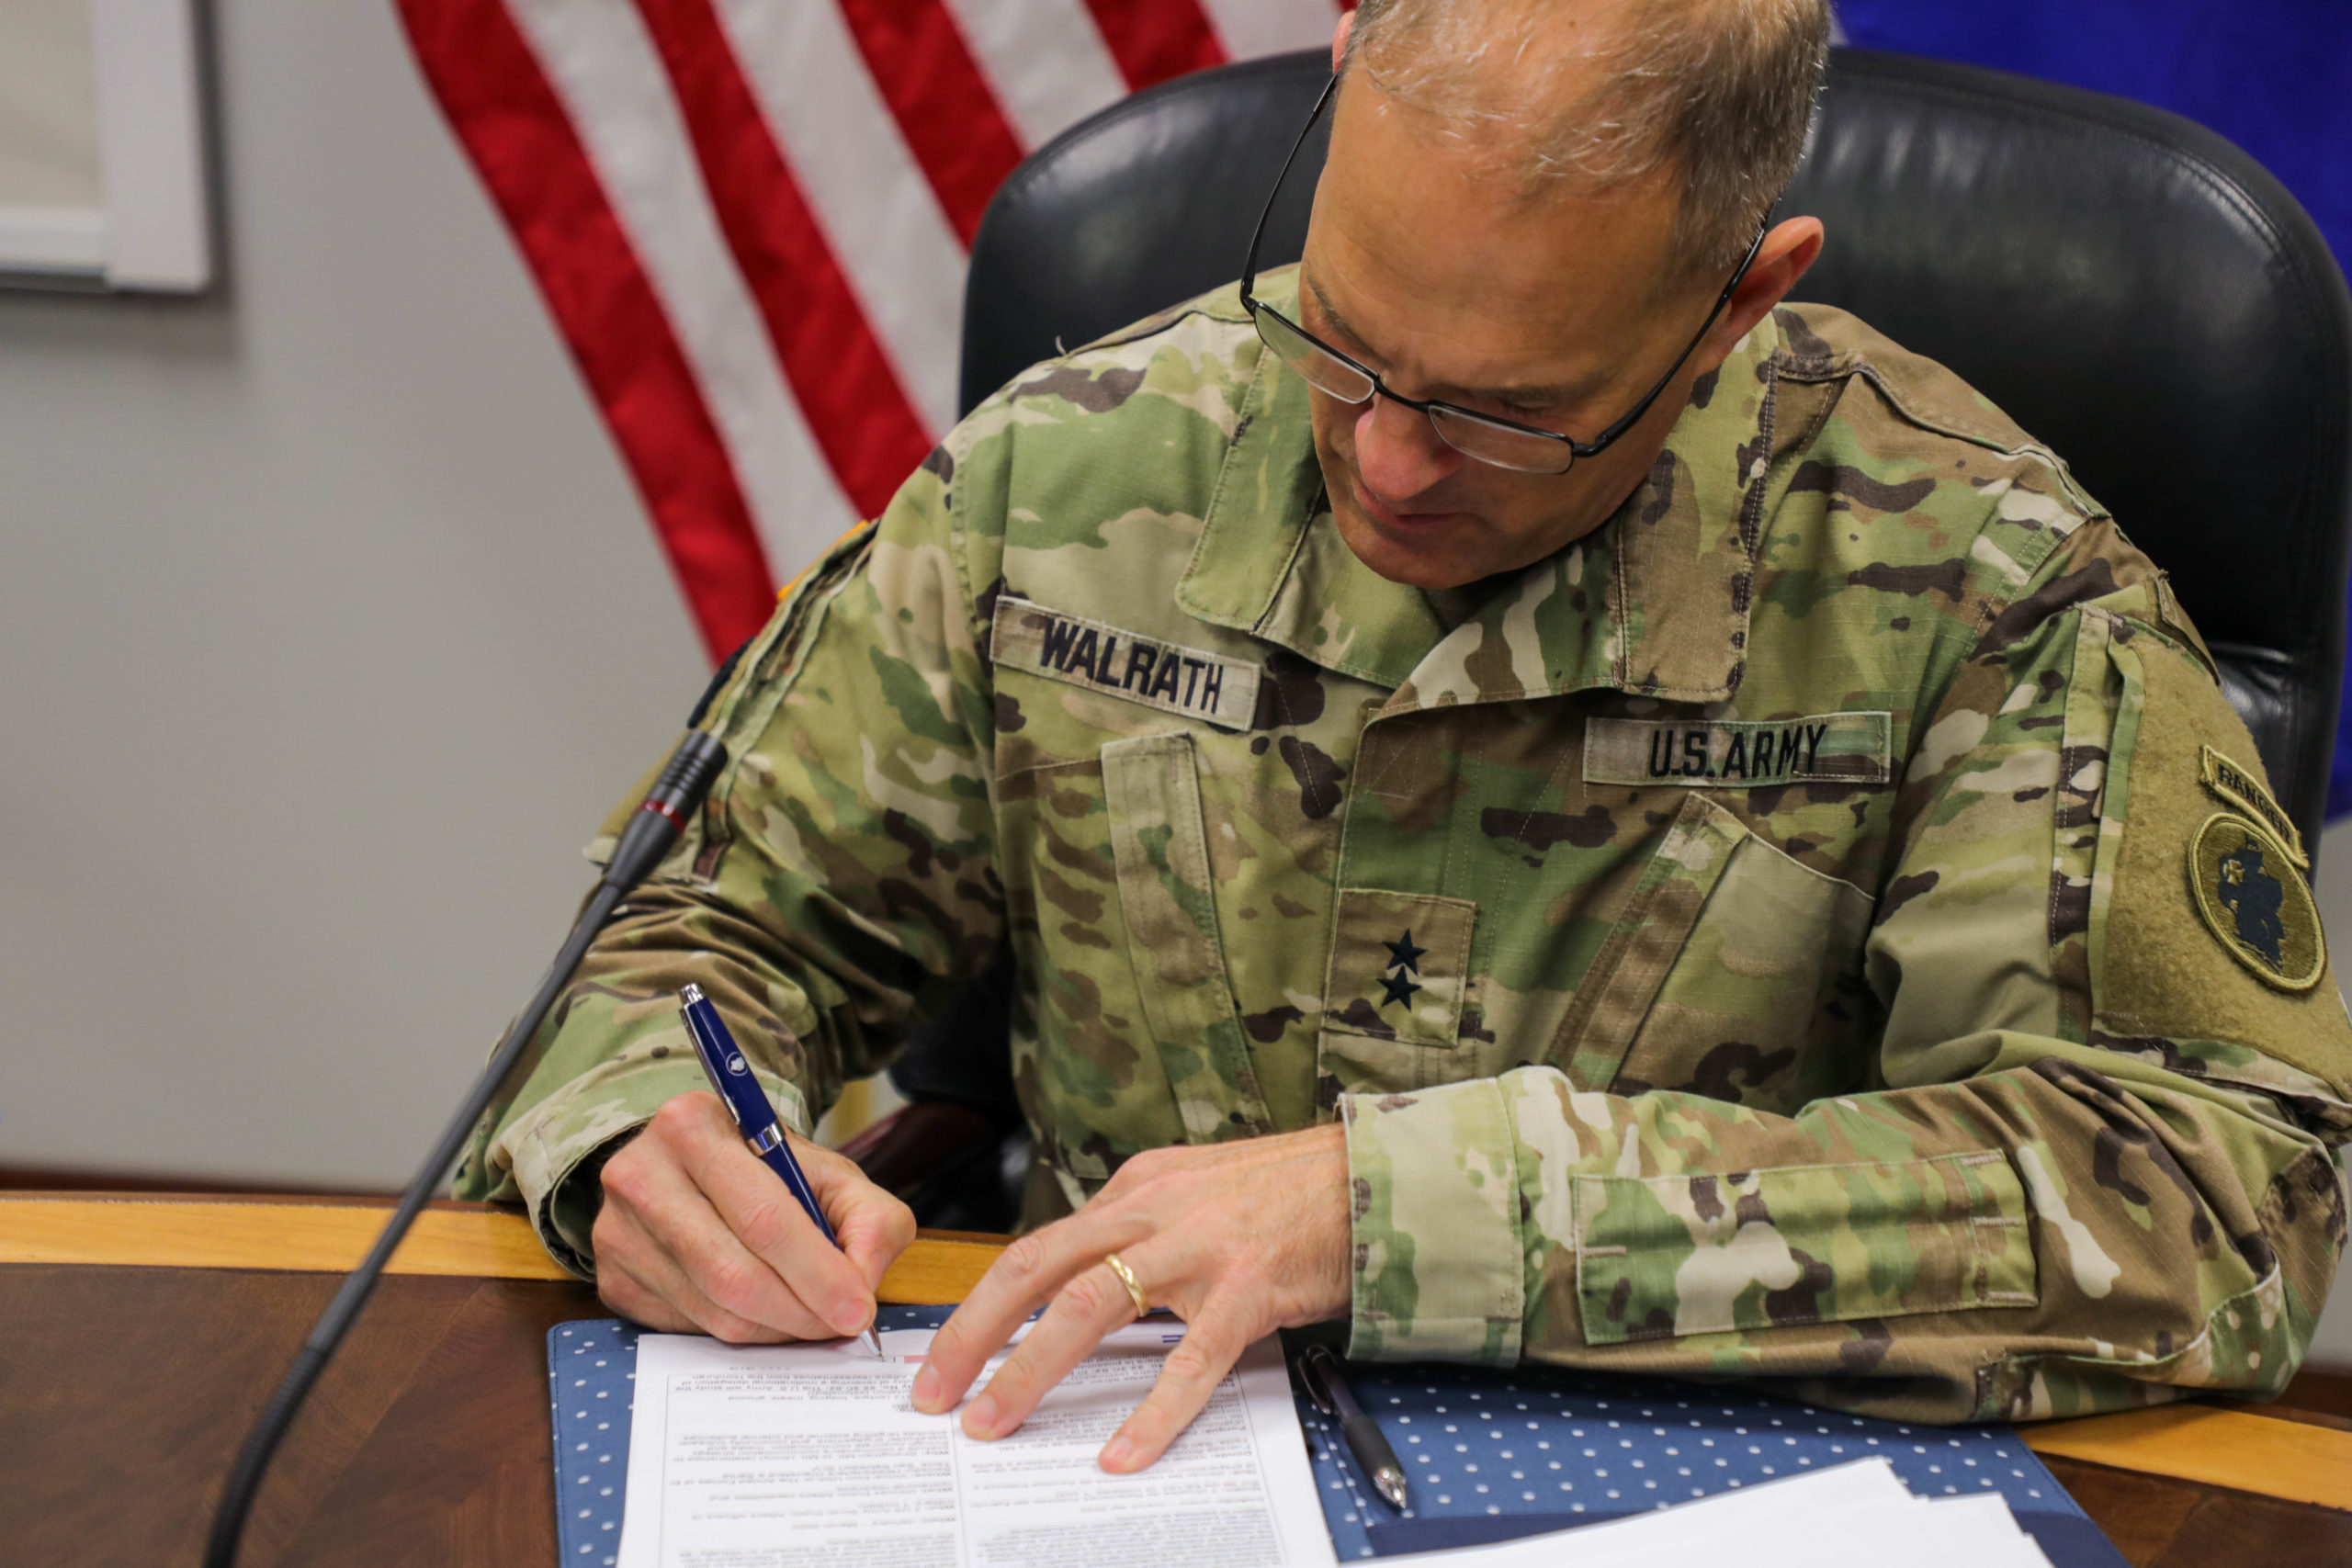 US, Salvadoran Armies Renew Training Opportunities in Central America Following Staff Talks